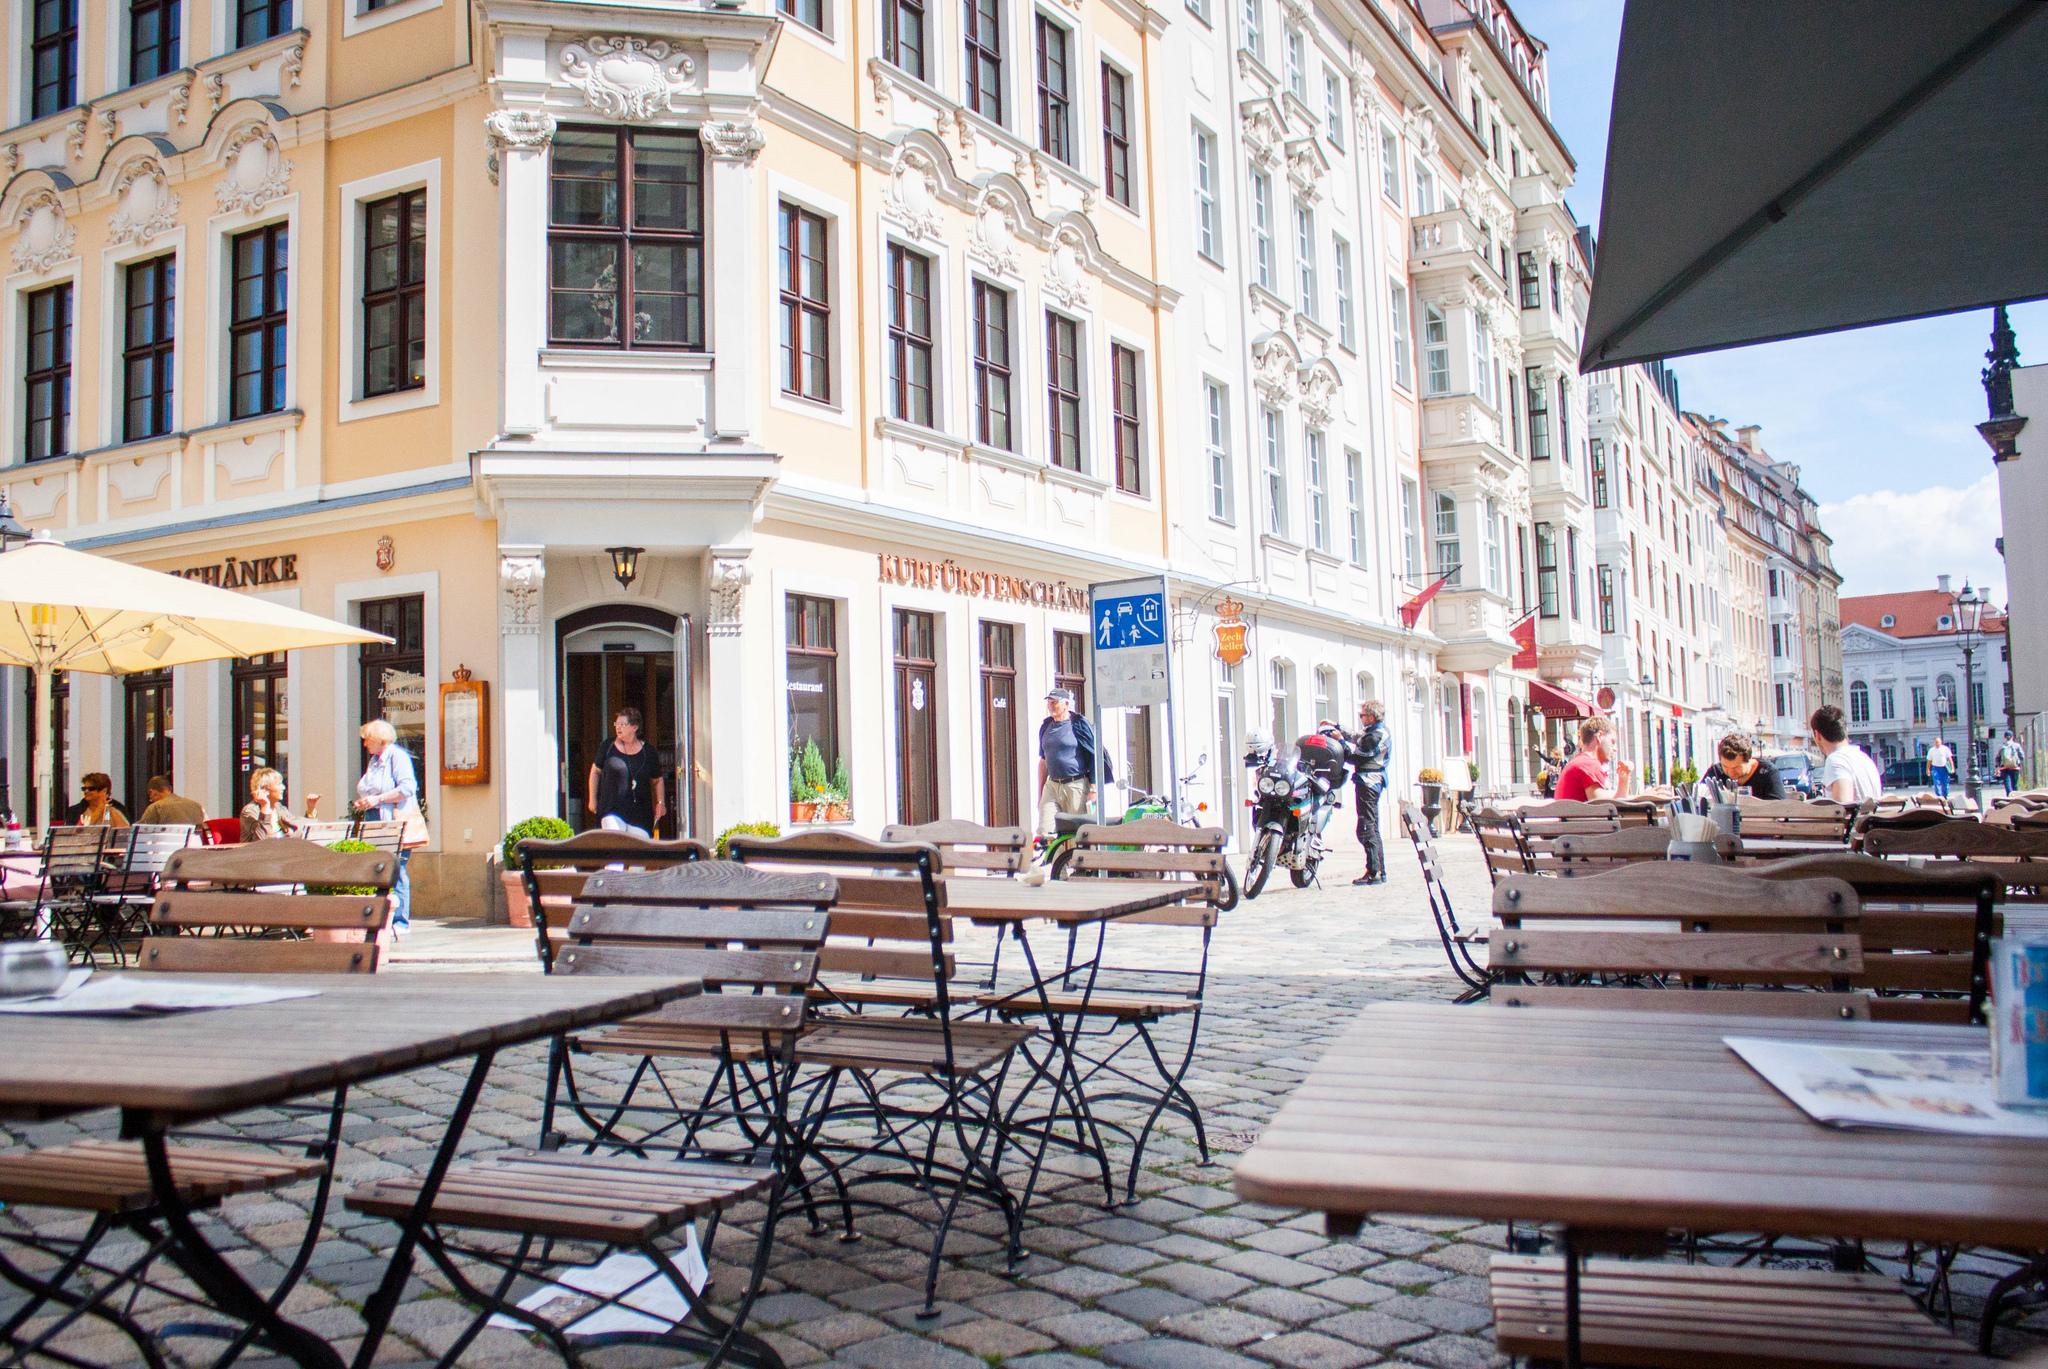 Guide to Dresden Neumarkt